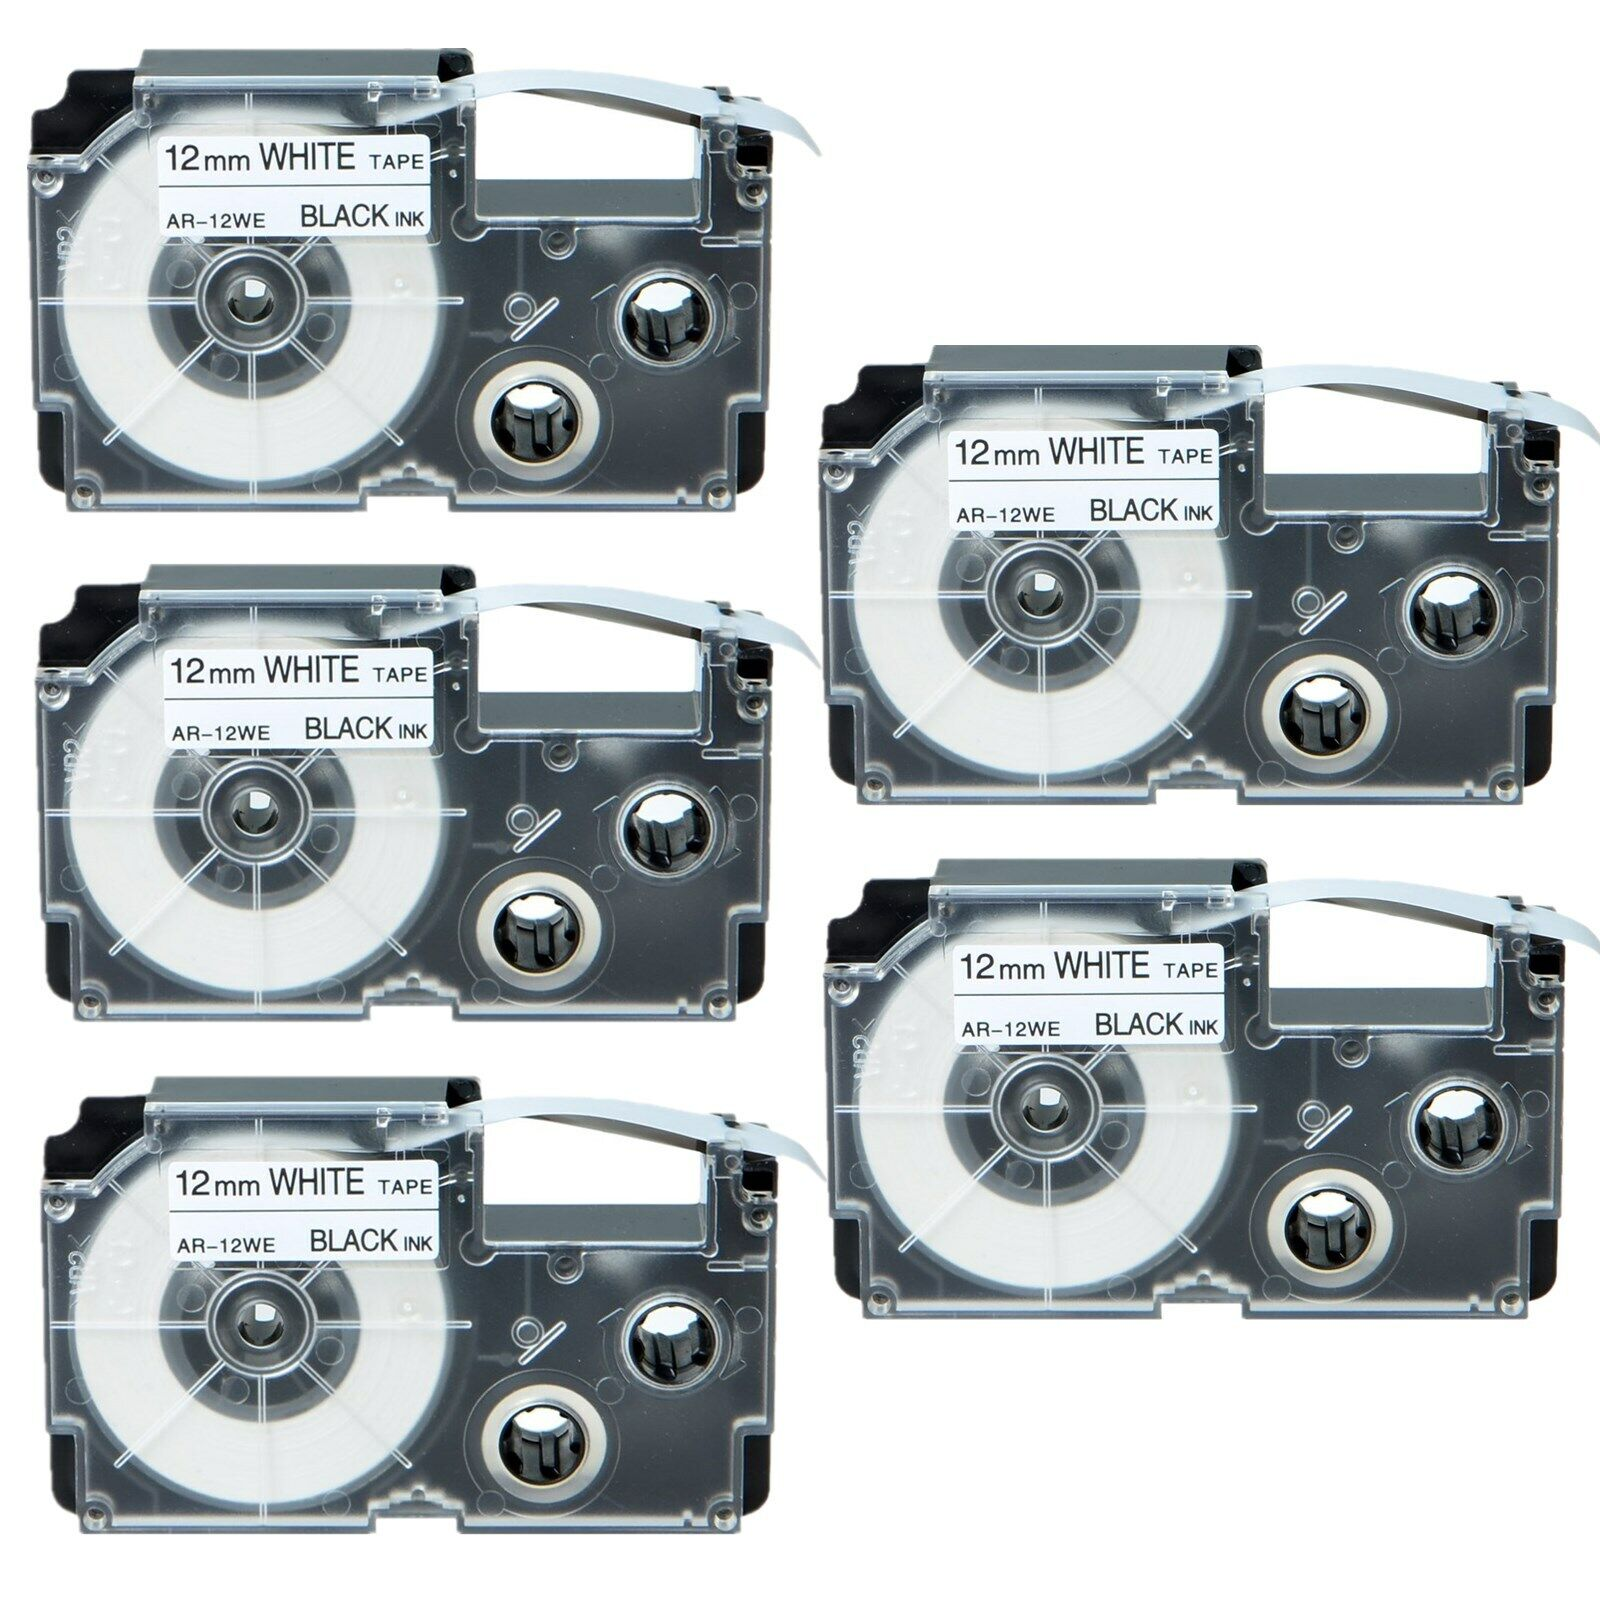 XR-9WE 9mm 8m Black on White Label Tape for EZ-Label Printer KL-1500 7200 7000KR